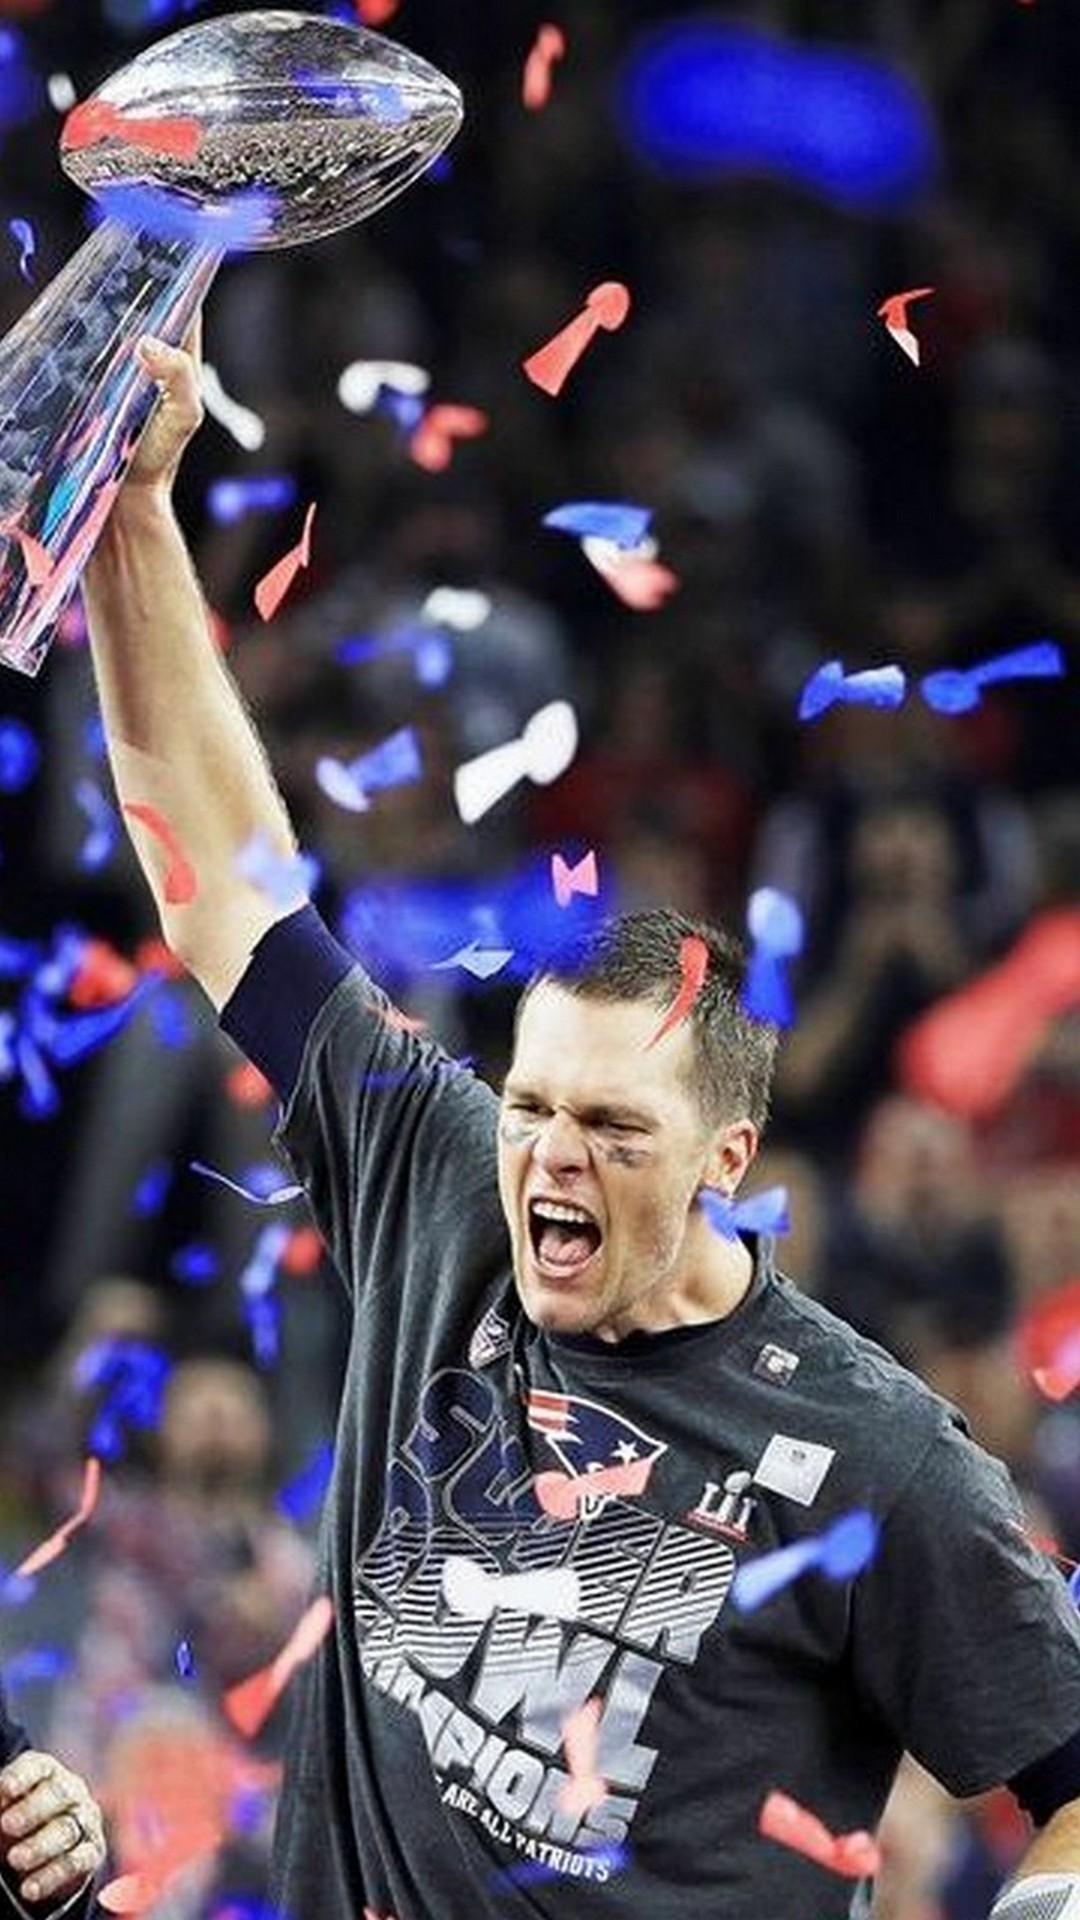 Tom Brady Wallpaper Iphone X Tom Brady Super Bowl Wallpaper Iphone 2019 3d Iphone